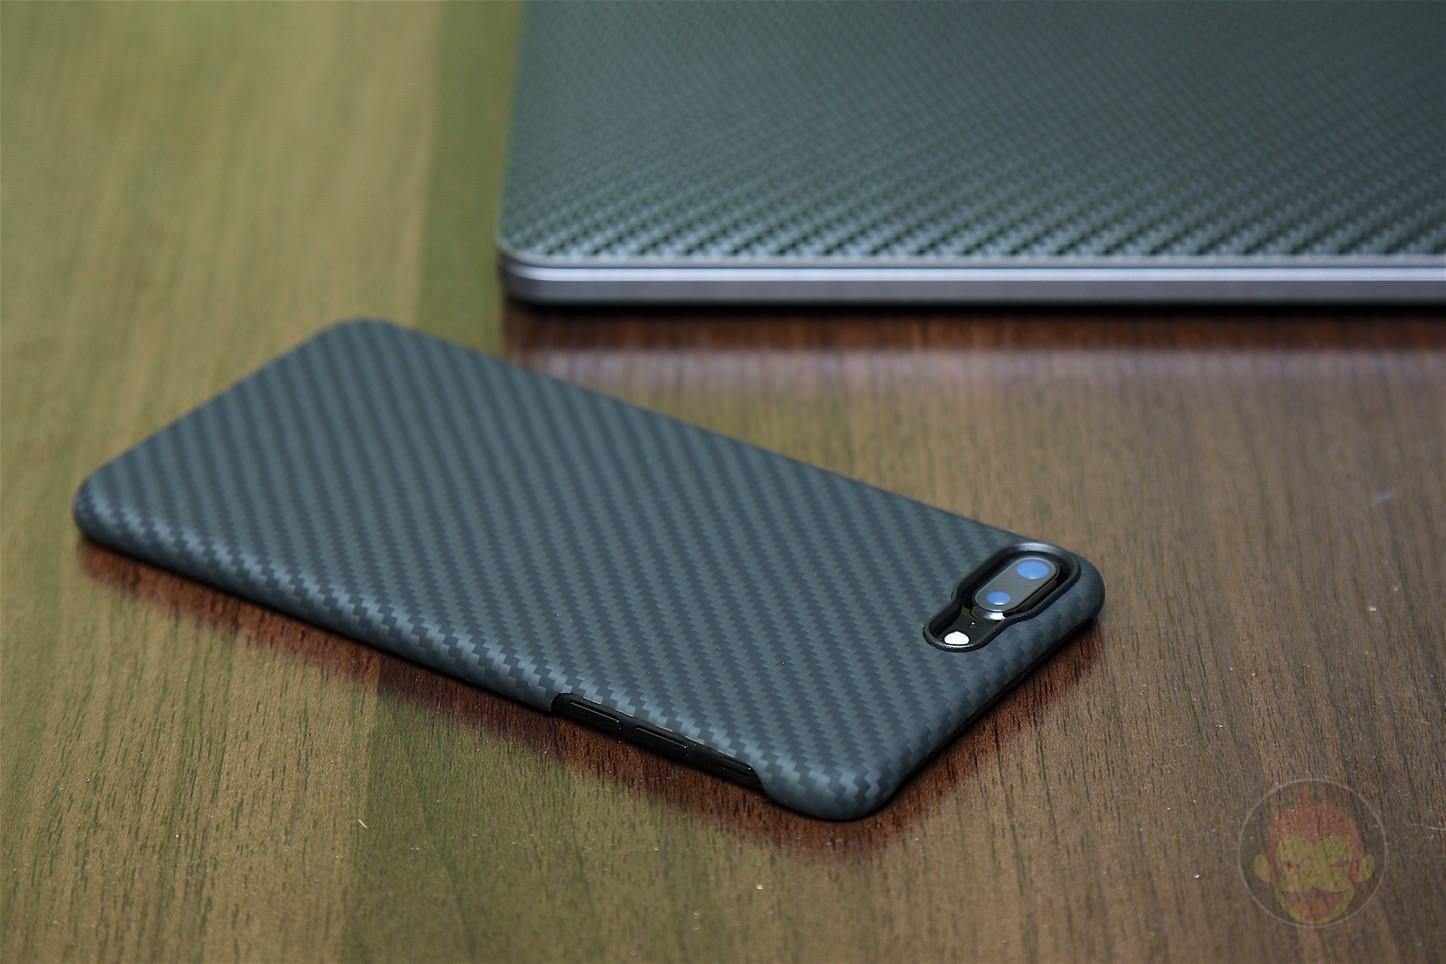 Pitaka-iPhone-Case-Review-11.jpg